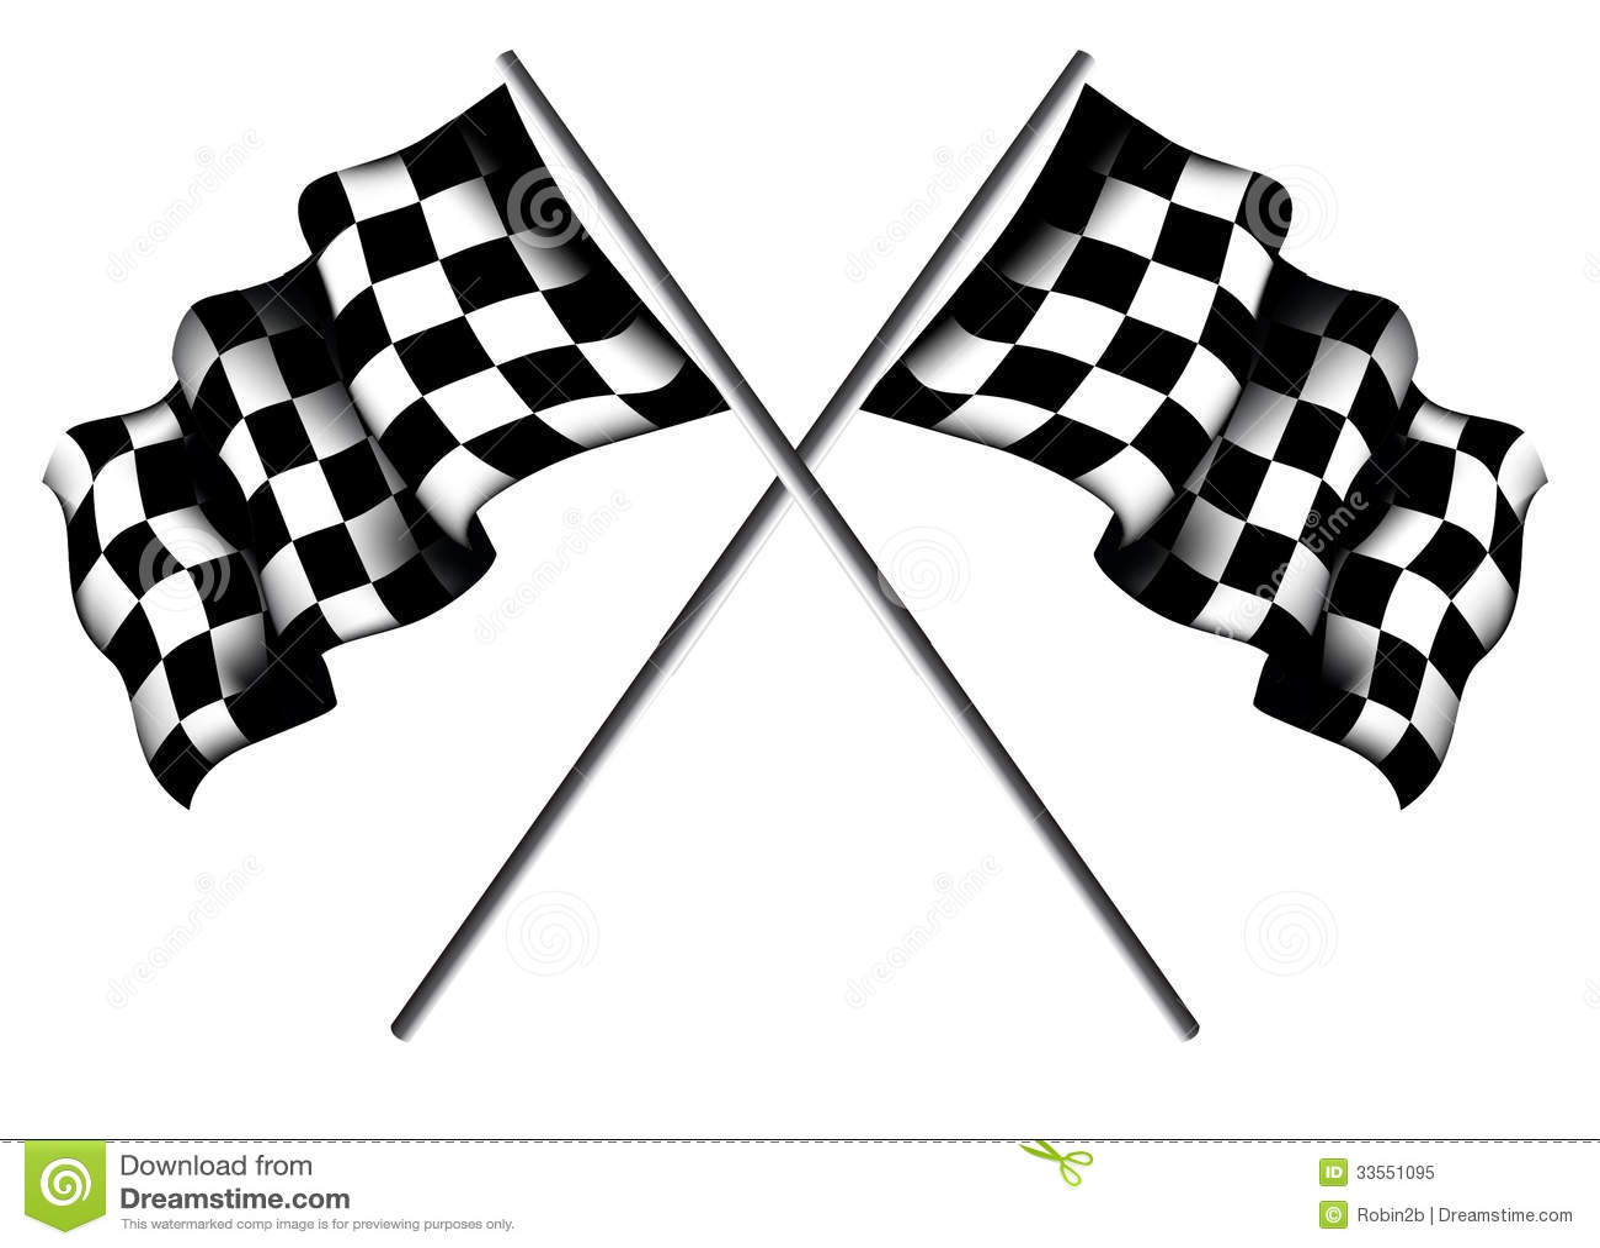 Race Car Flags For Sale